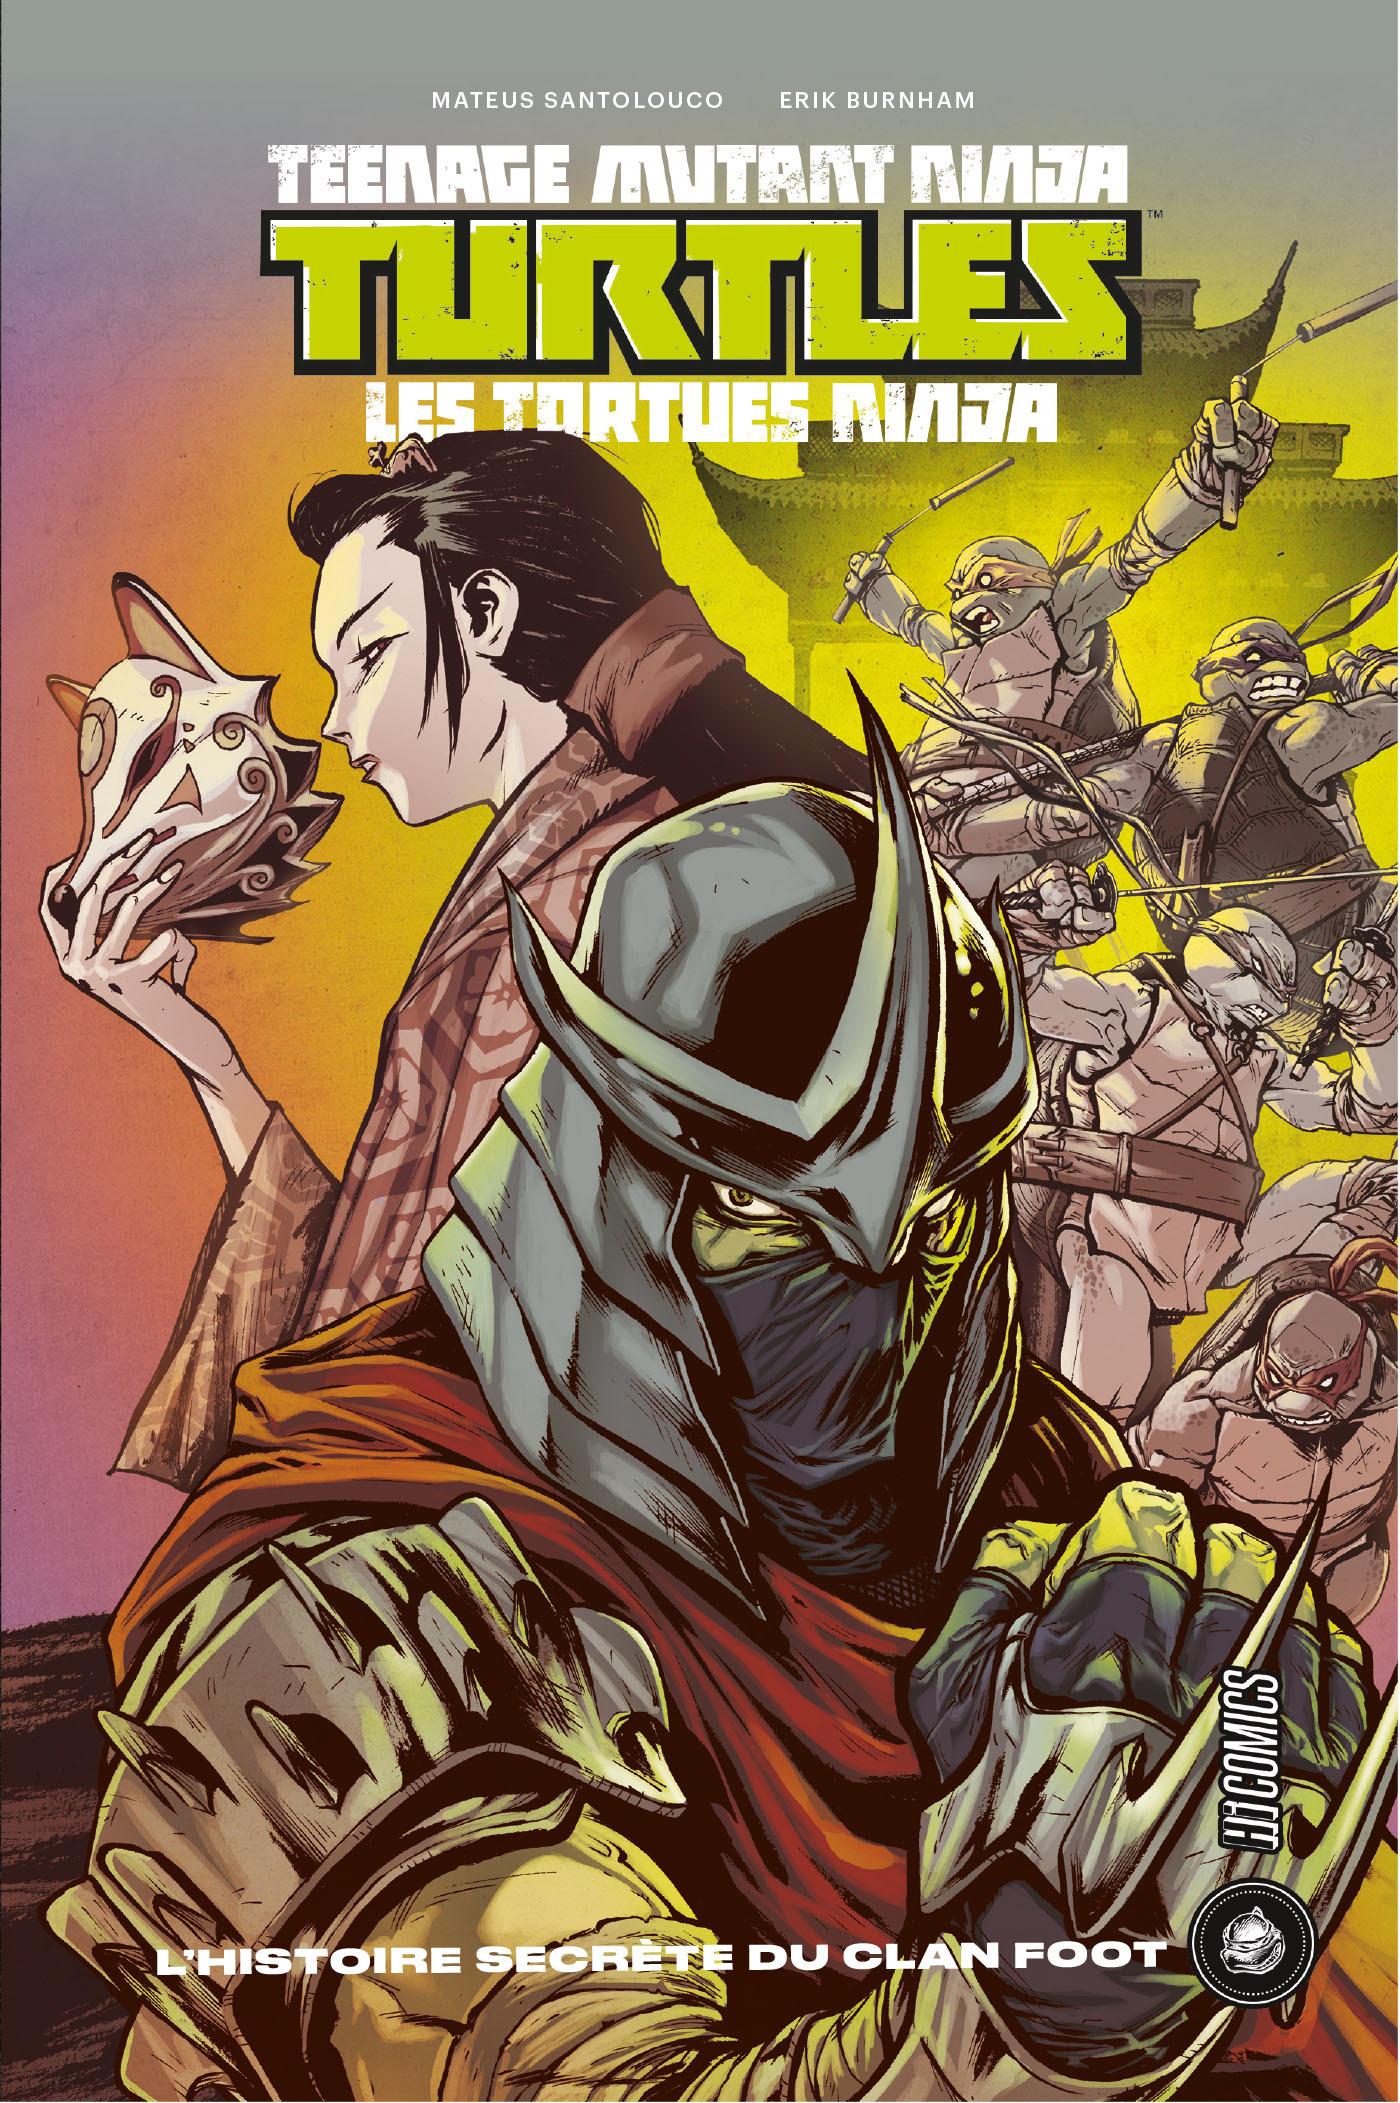 Les Tortues Ninja - TMNT ; l'histoire secrète du clan foot